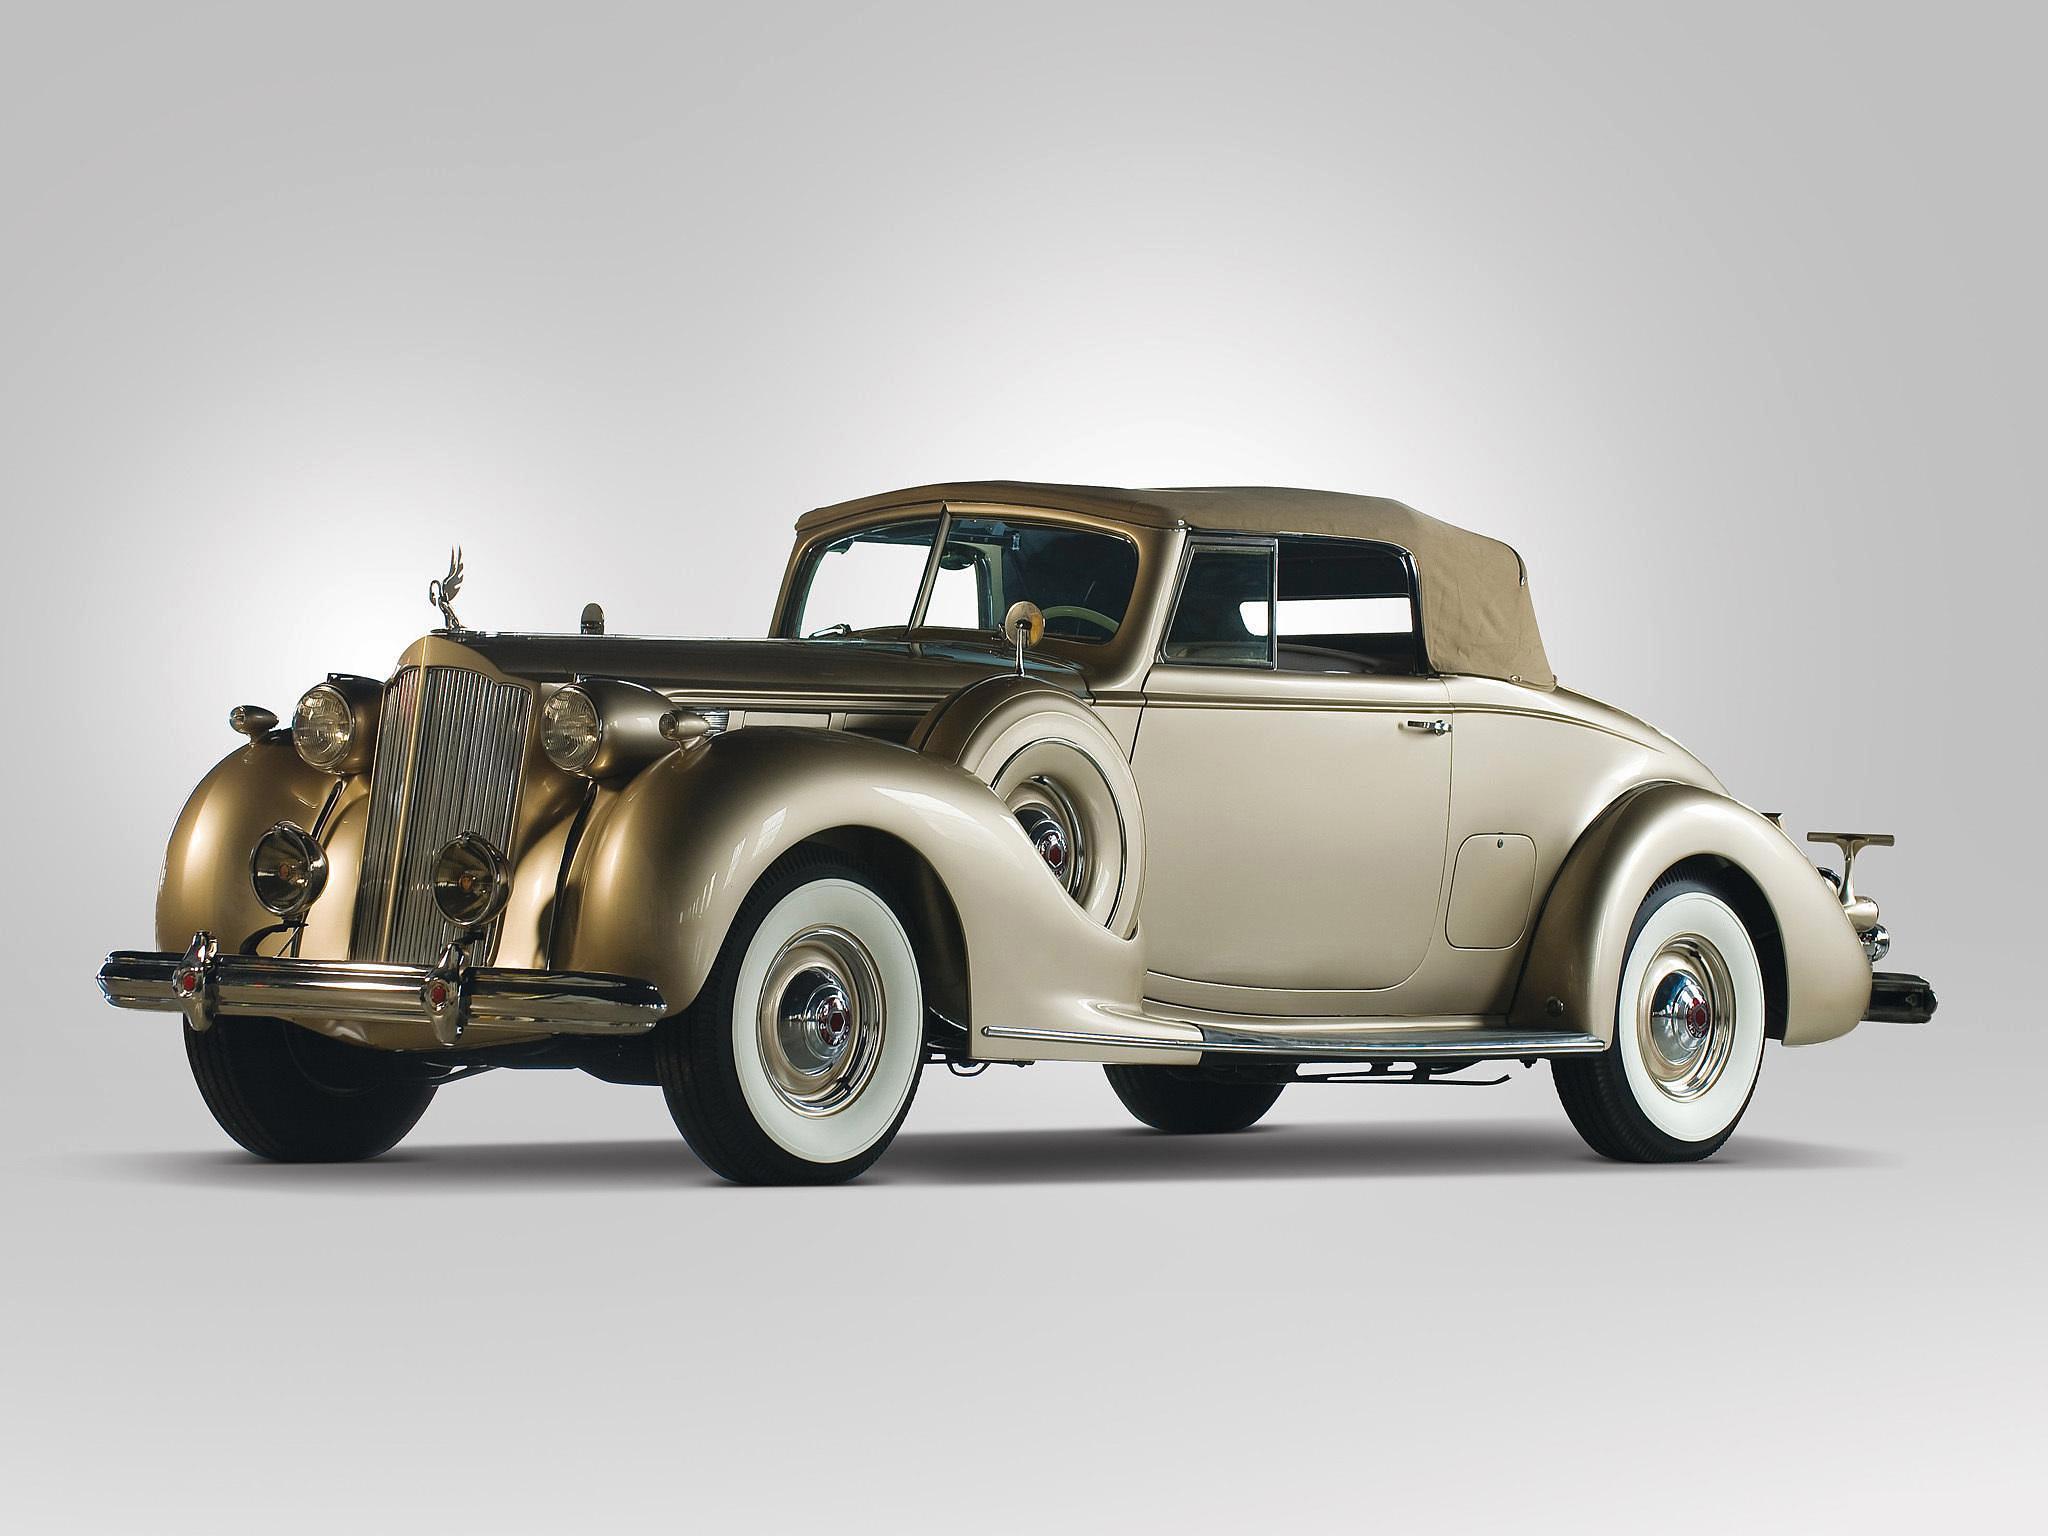 1938 Packard Twelve Convertible Coupe Full HD Wallpaper